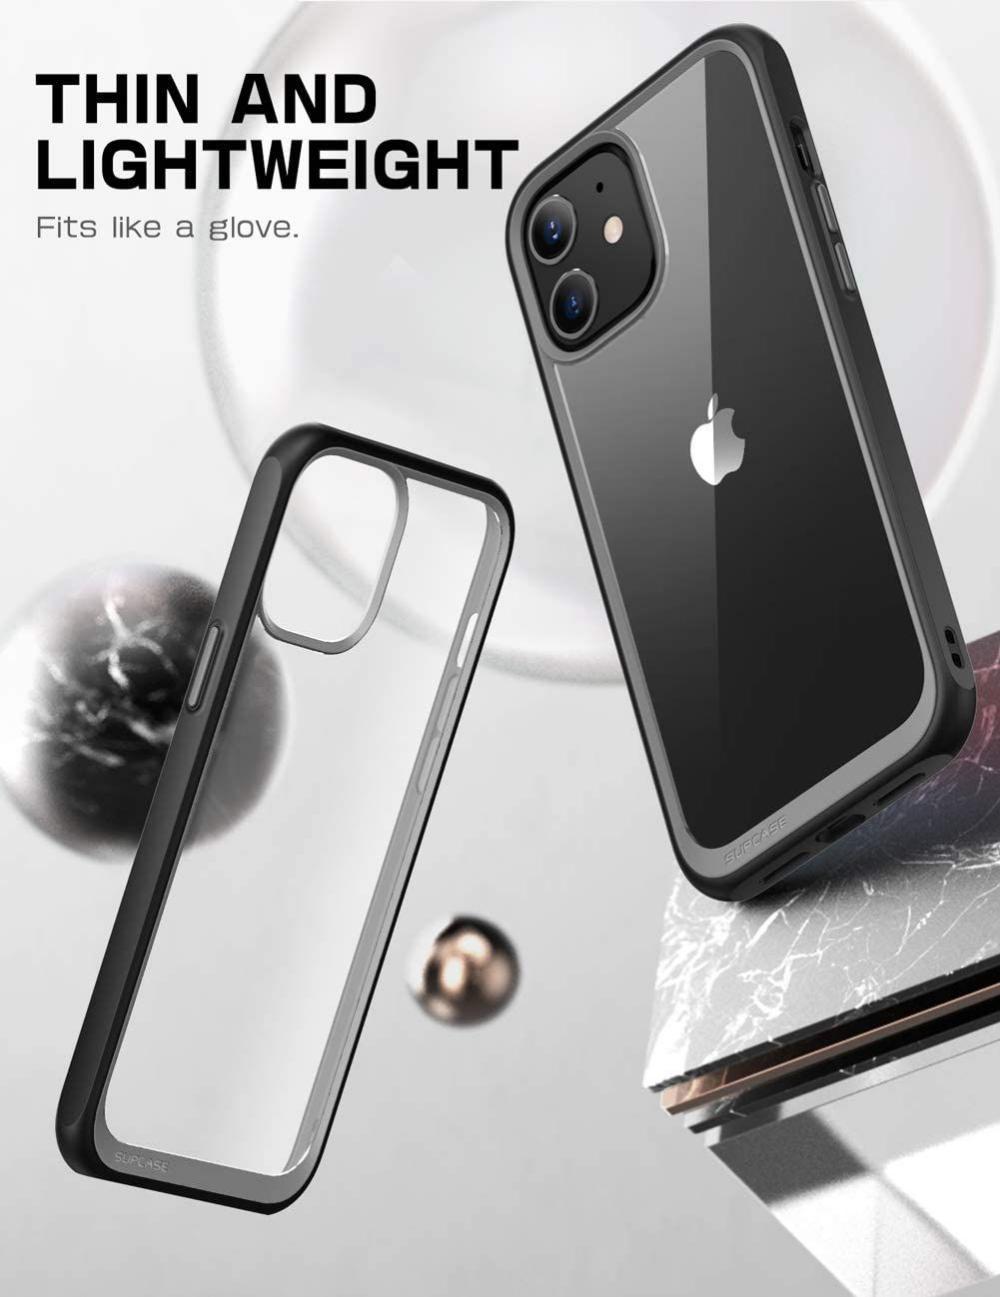 Supcase Unicorn Ub Style Premium Bumper Protective Case For Iphone 12 Iphone 12 Pro 12 Pro Max (2)